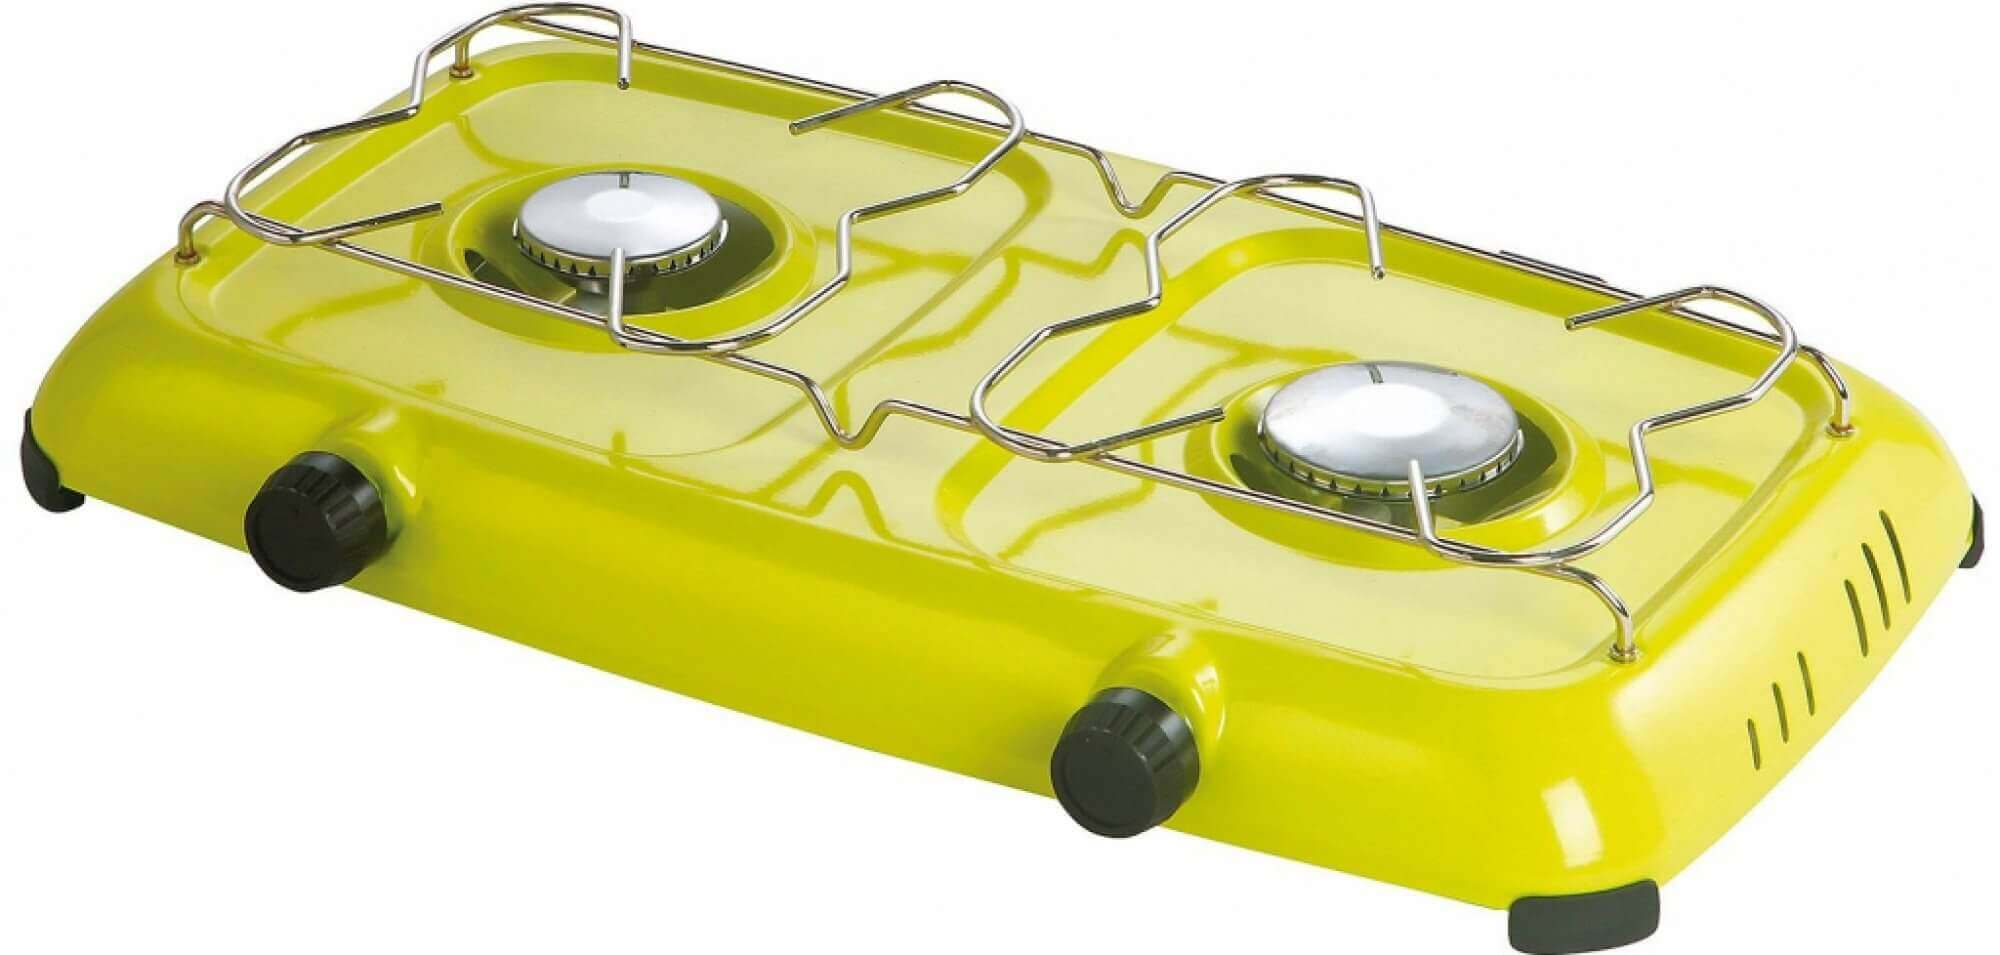 MEVA Vařič na Propan-butan - 2 plotýnky domácí dvouplotýnkový vařič na Propan-butan